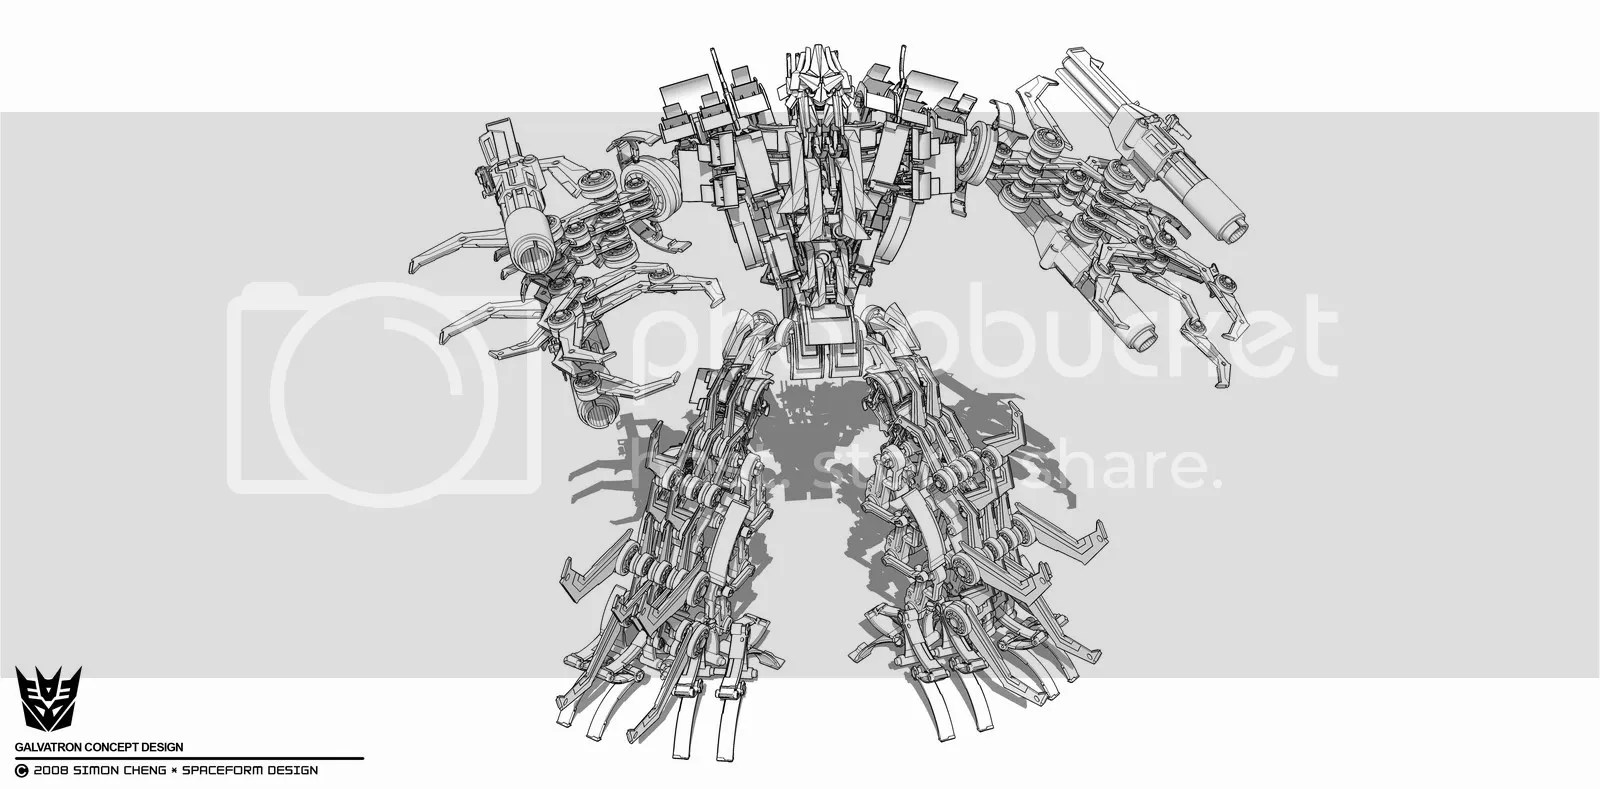 Art: transformers concept & other concept works > pls go